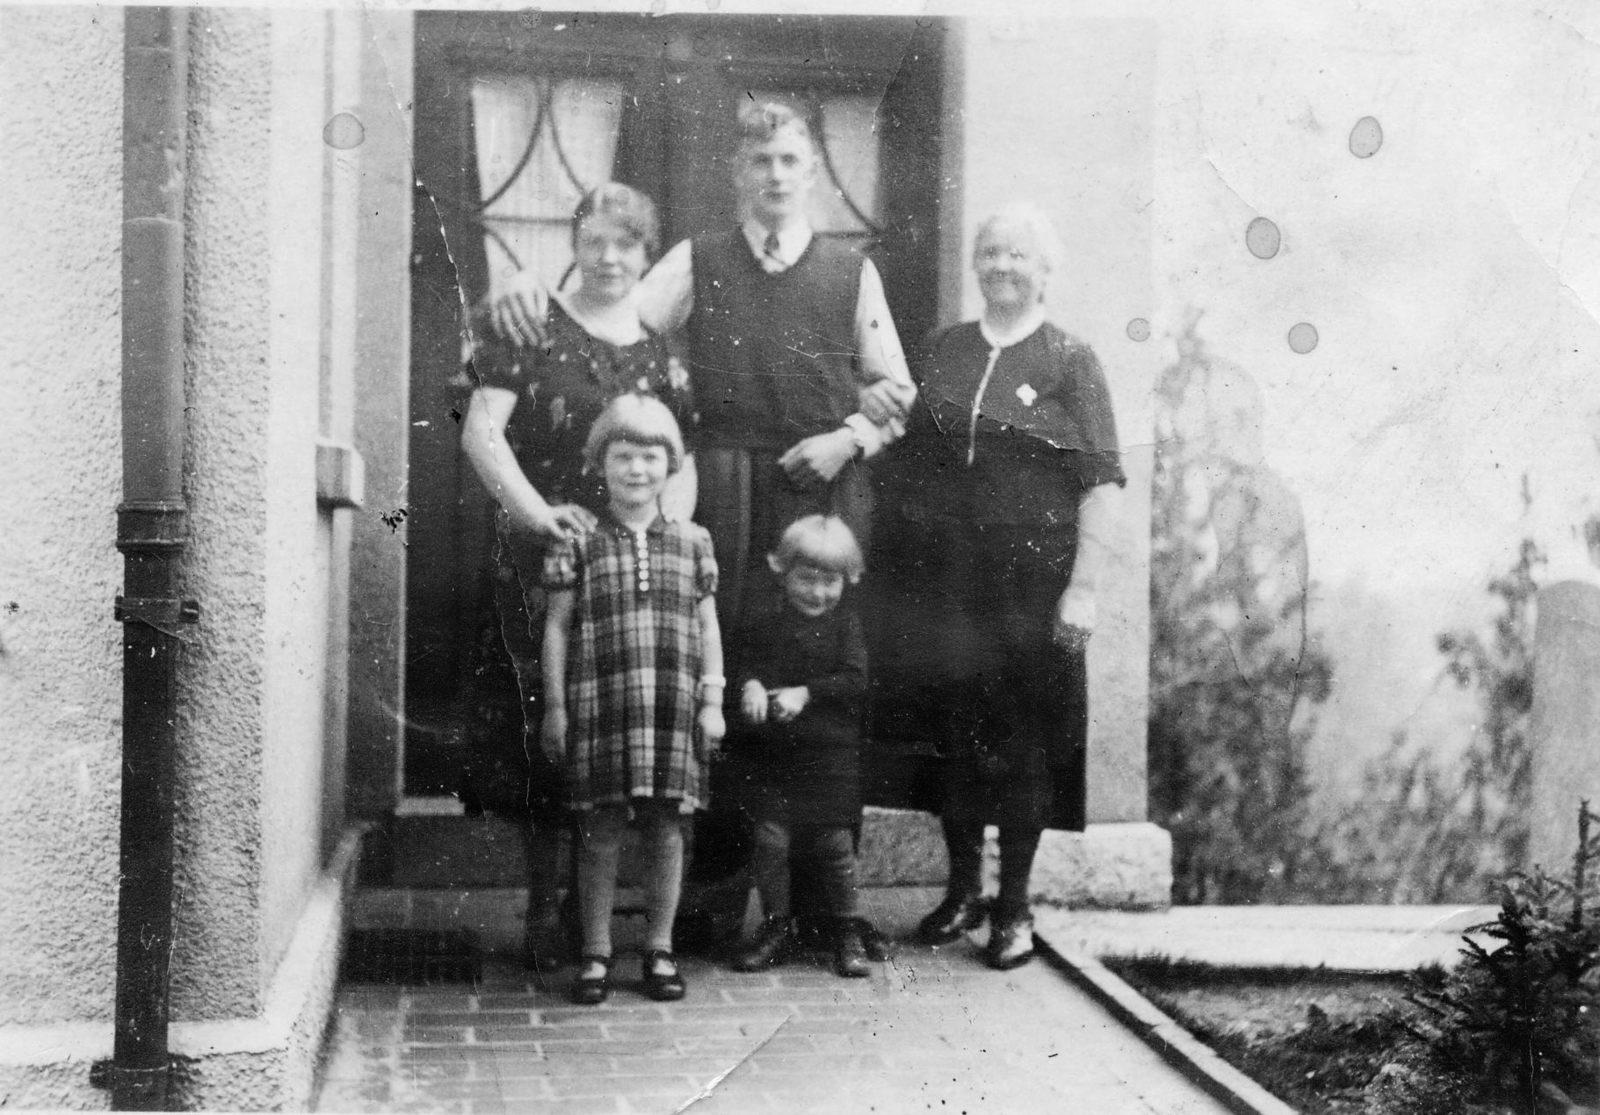 WH 1940 Oma Änne Hannes vor Haus